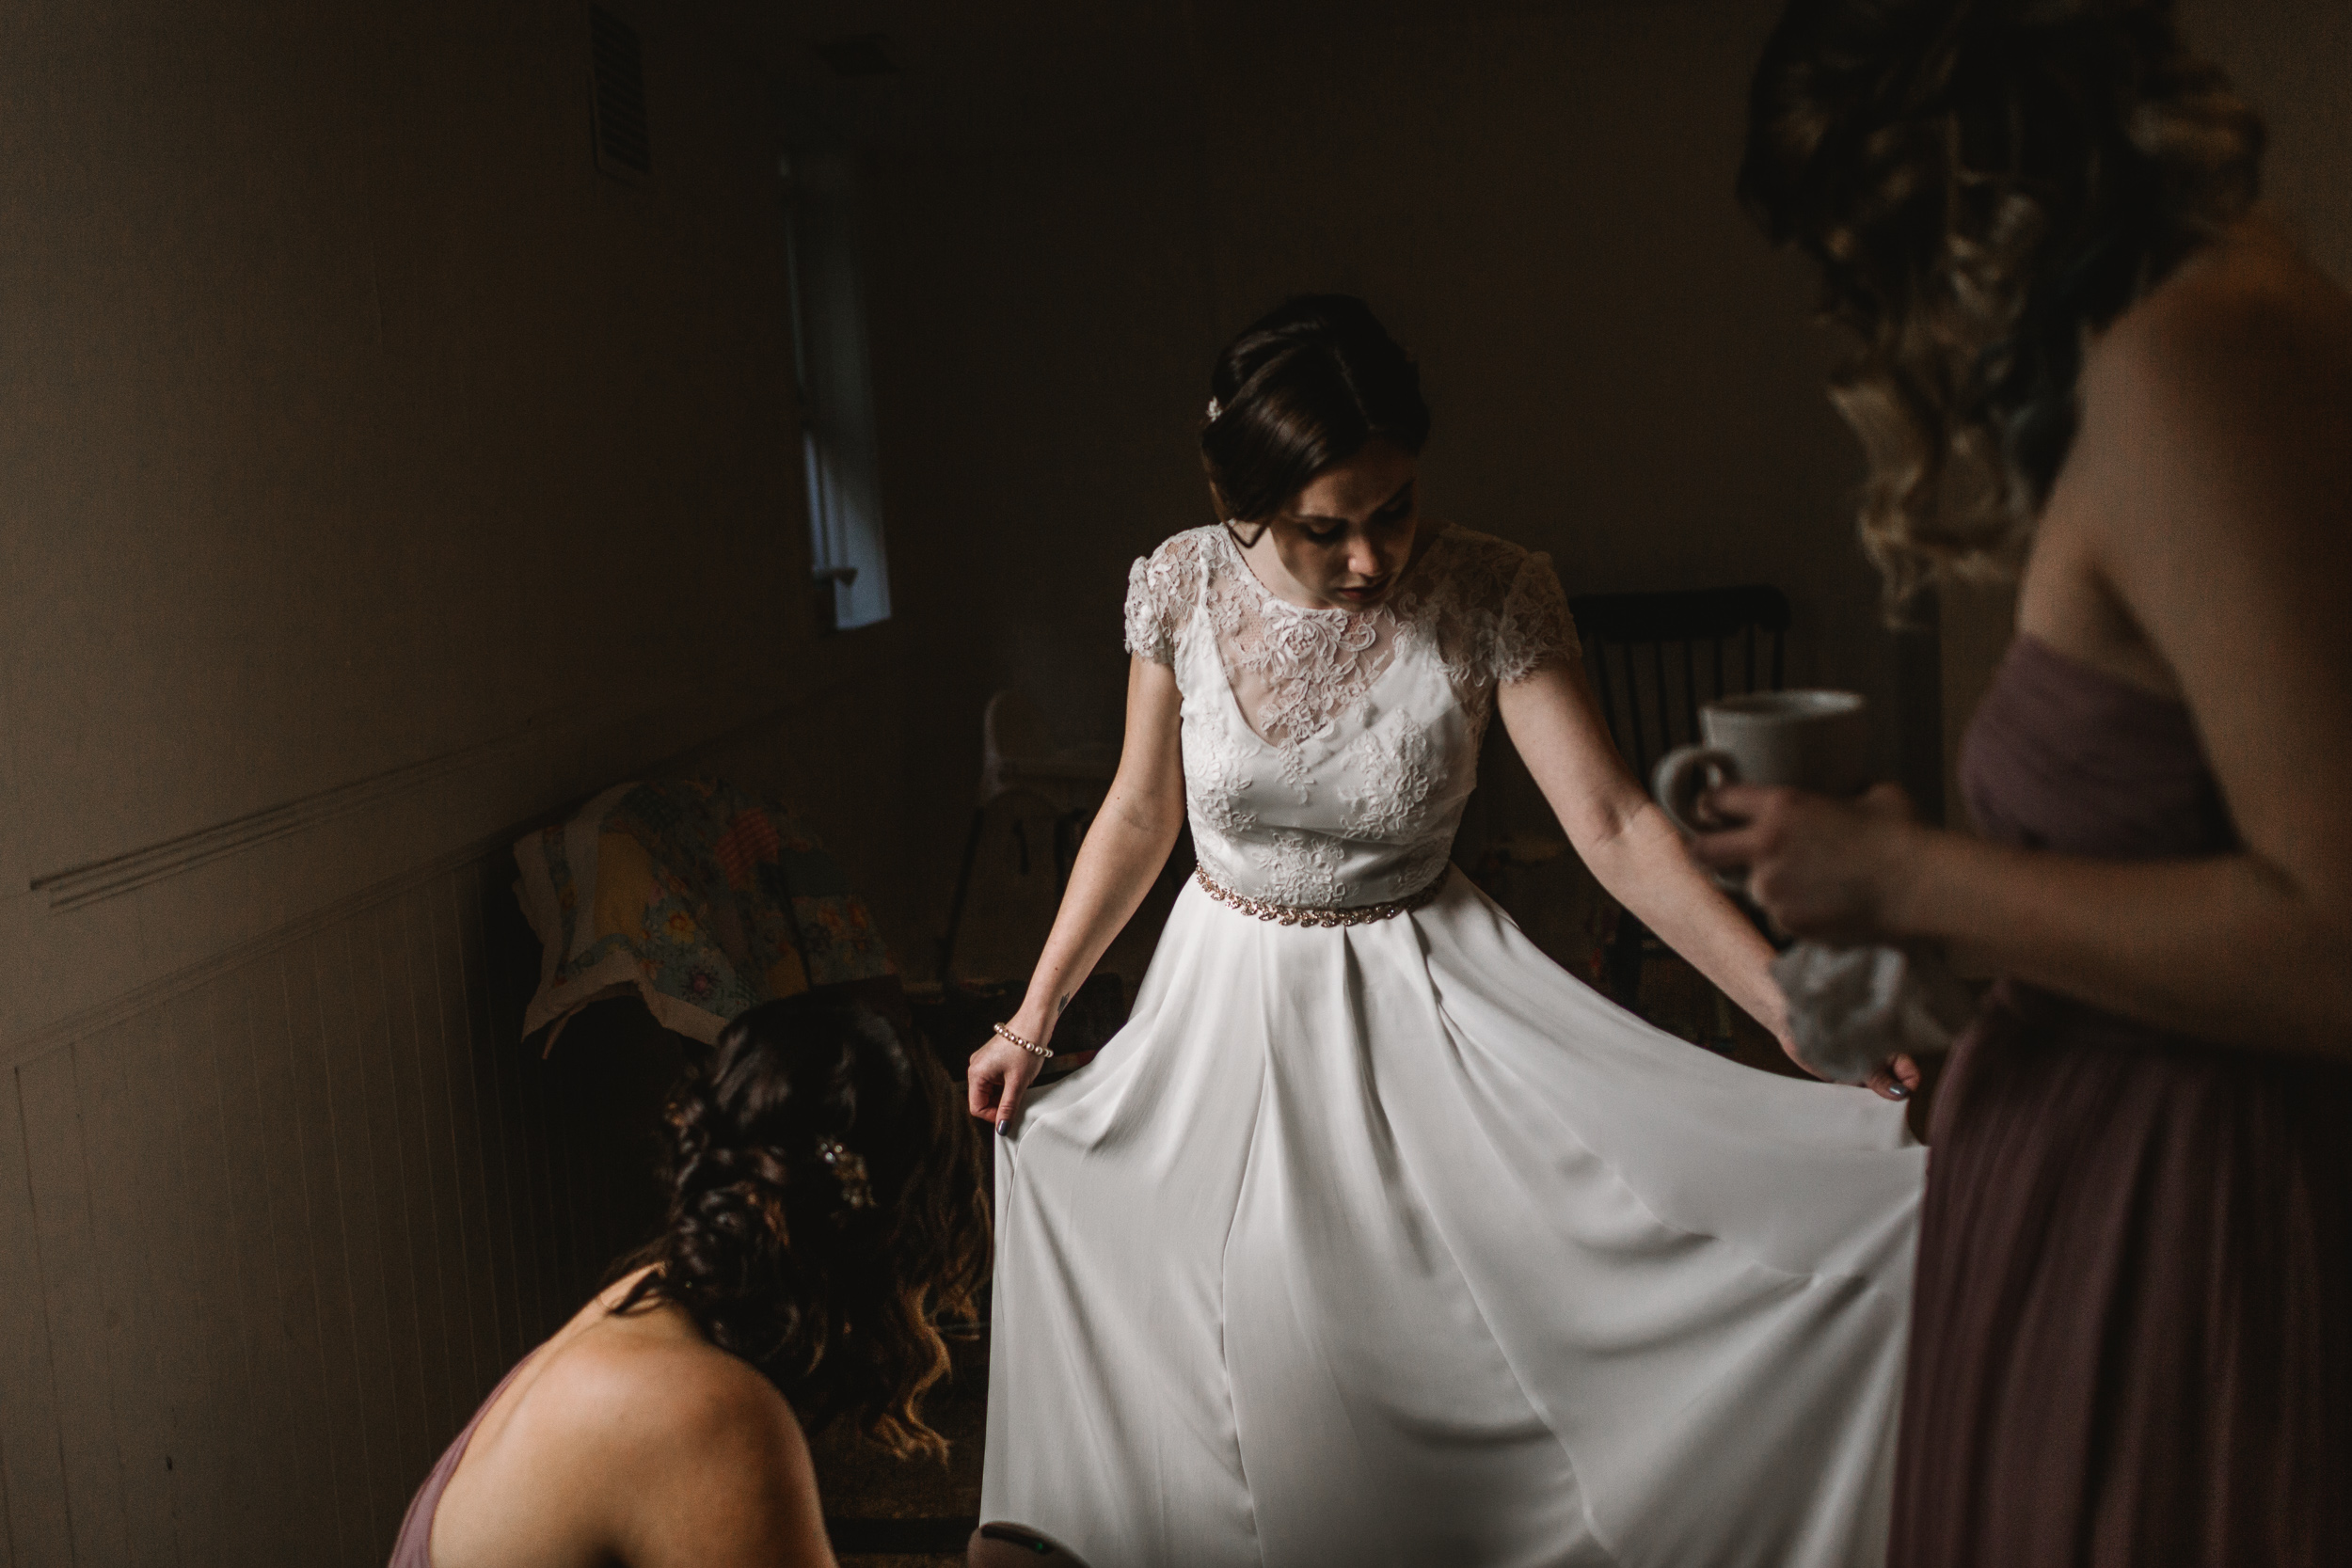 door-of-hope-wedding-portland-artistic-wedding-photography-1692.jpg